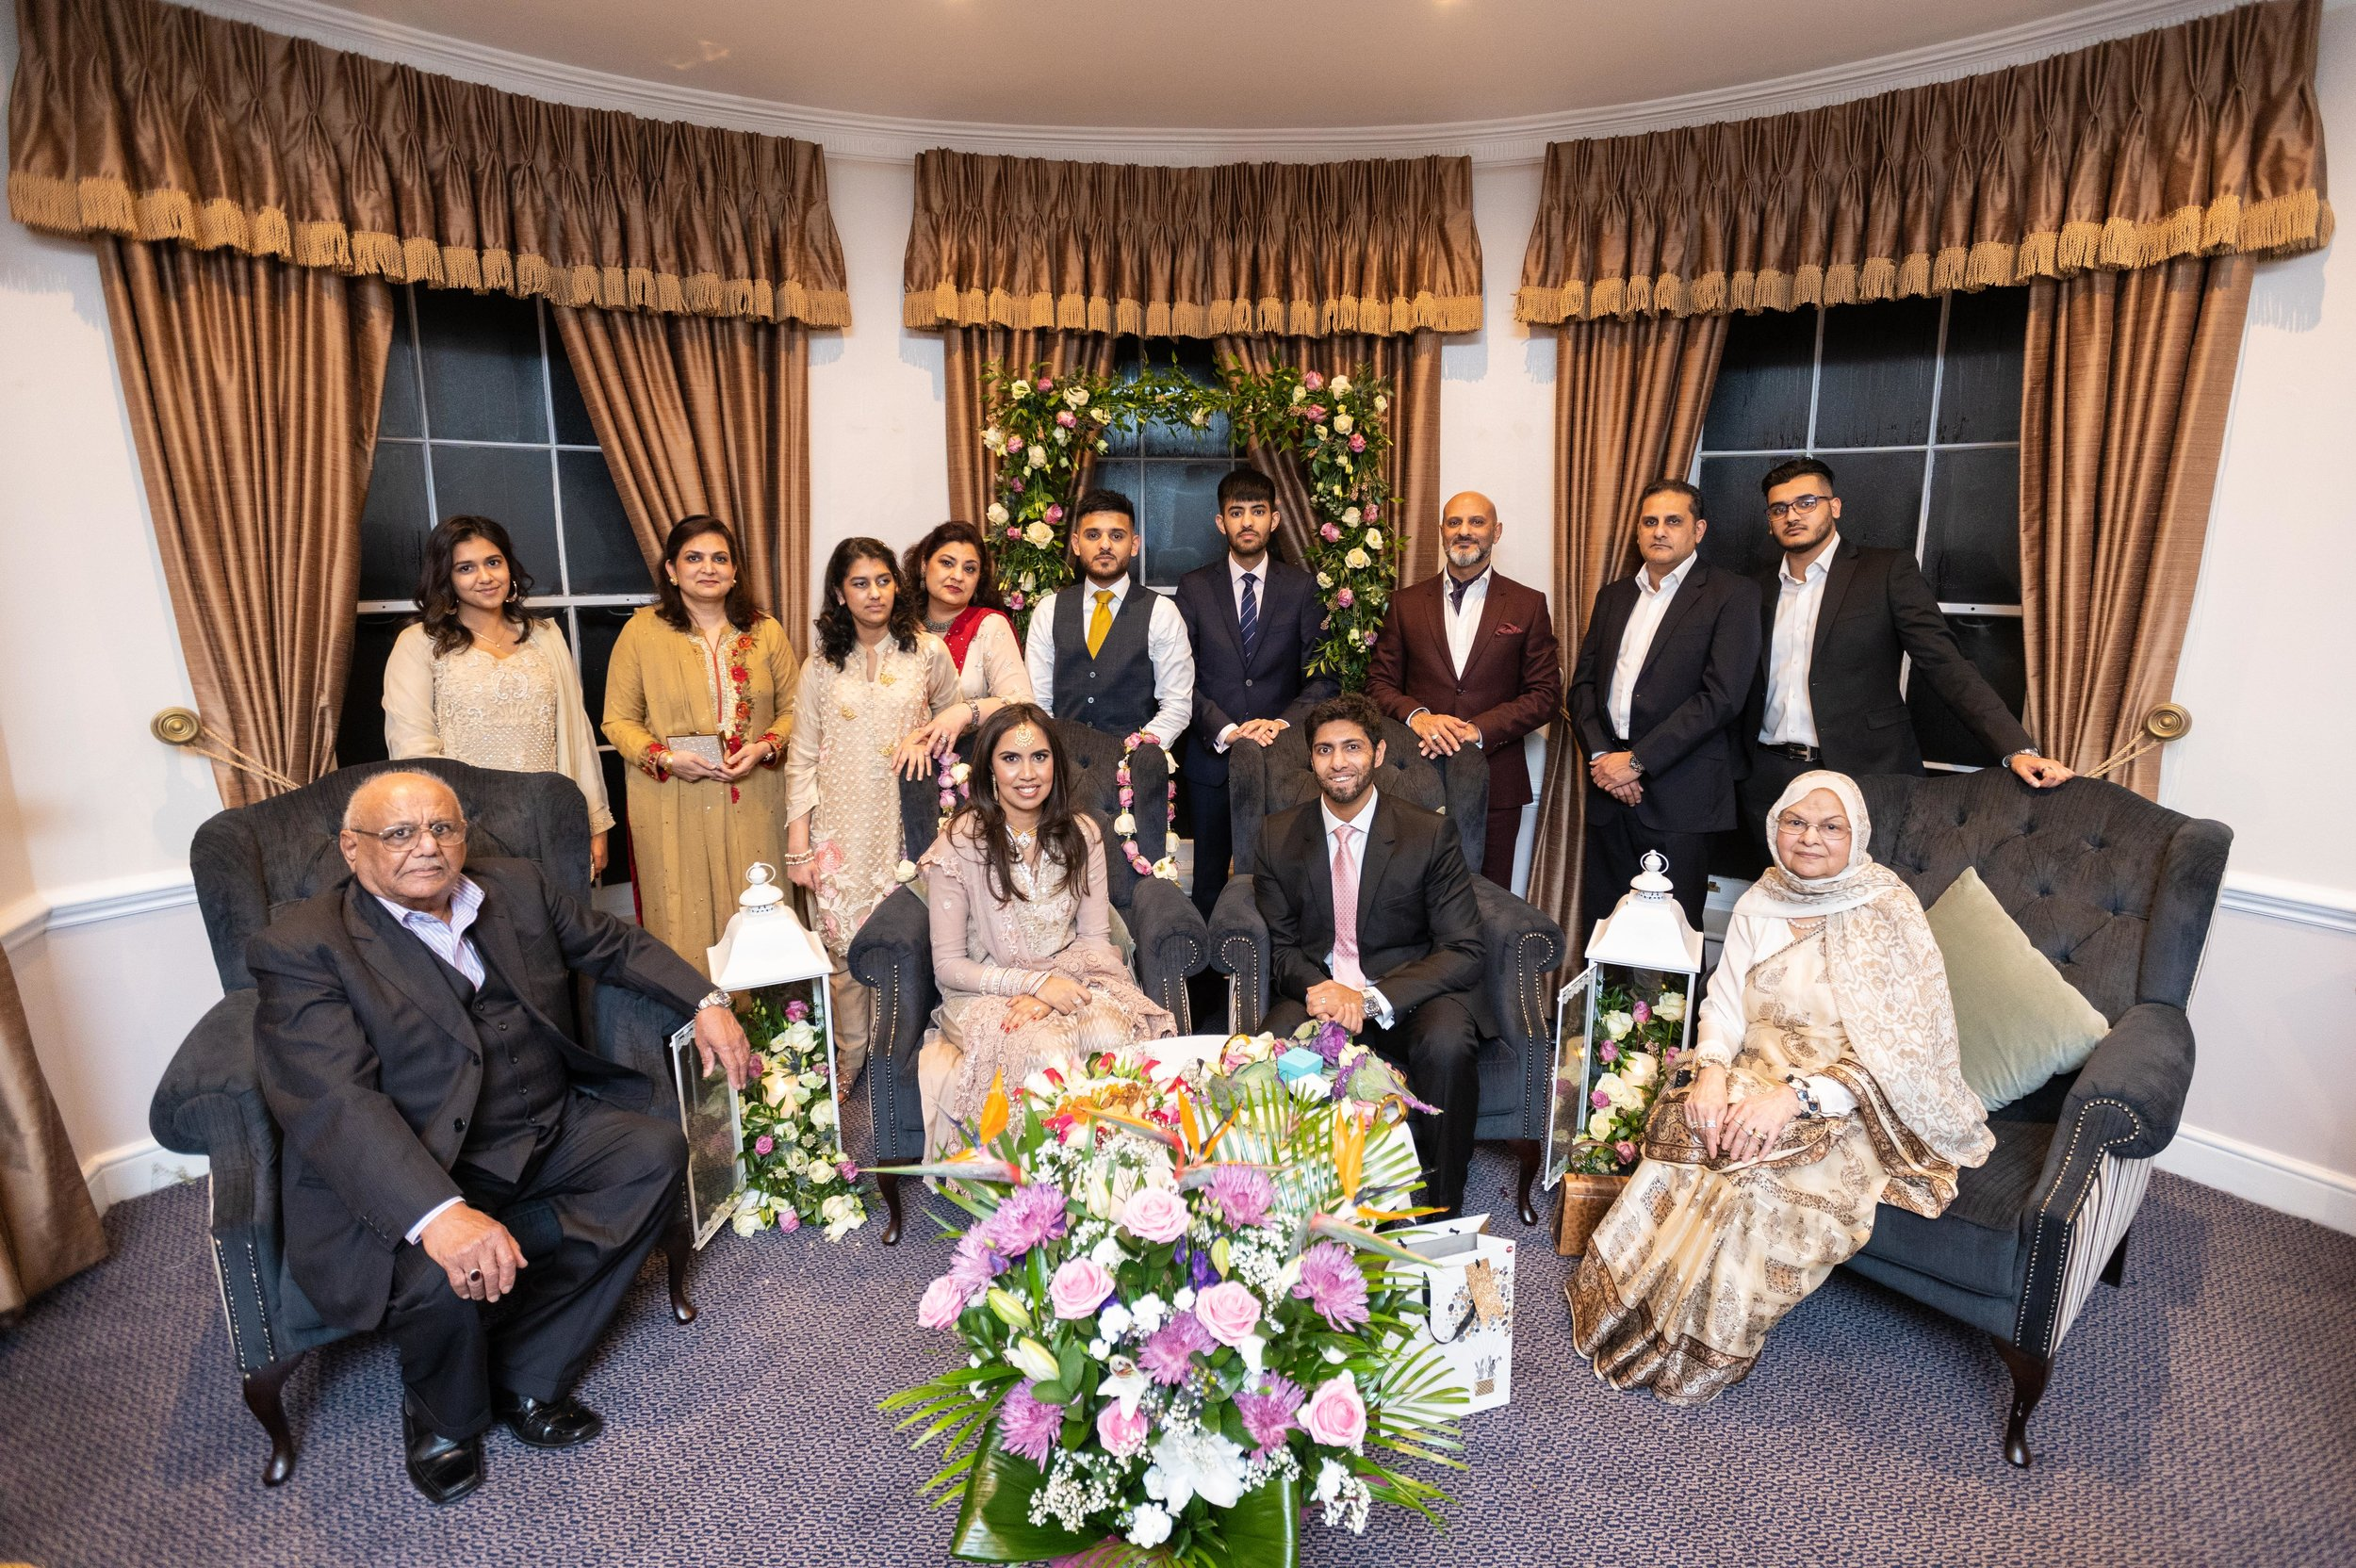 buckinghamshire-golf-club-winter-muslim-wedding-engagement-photography-videography-60